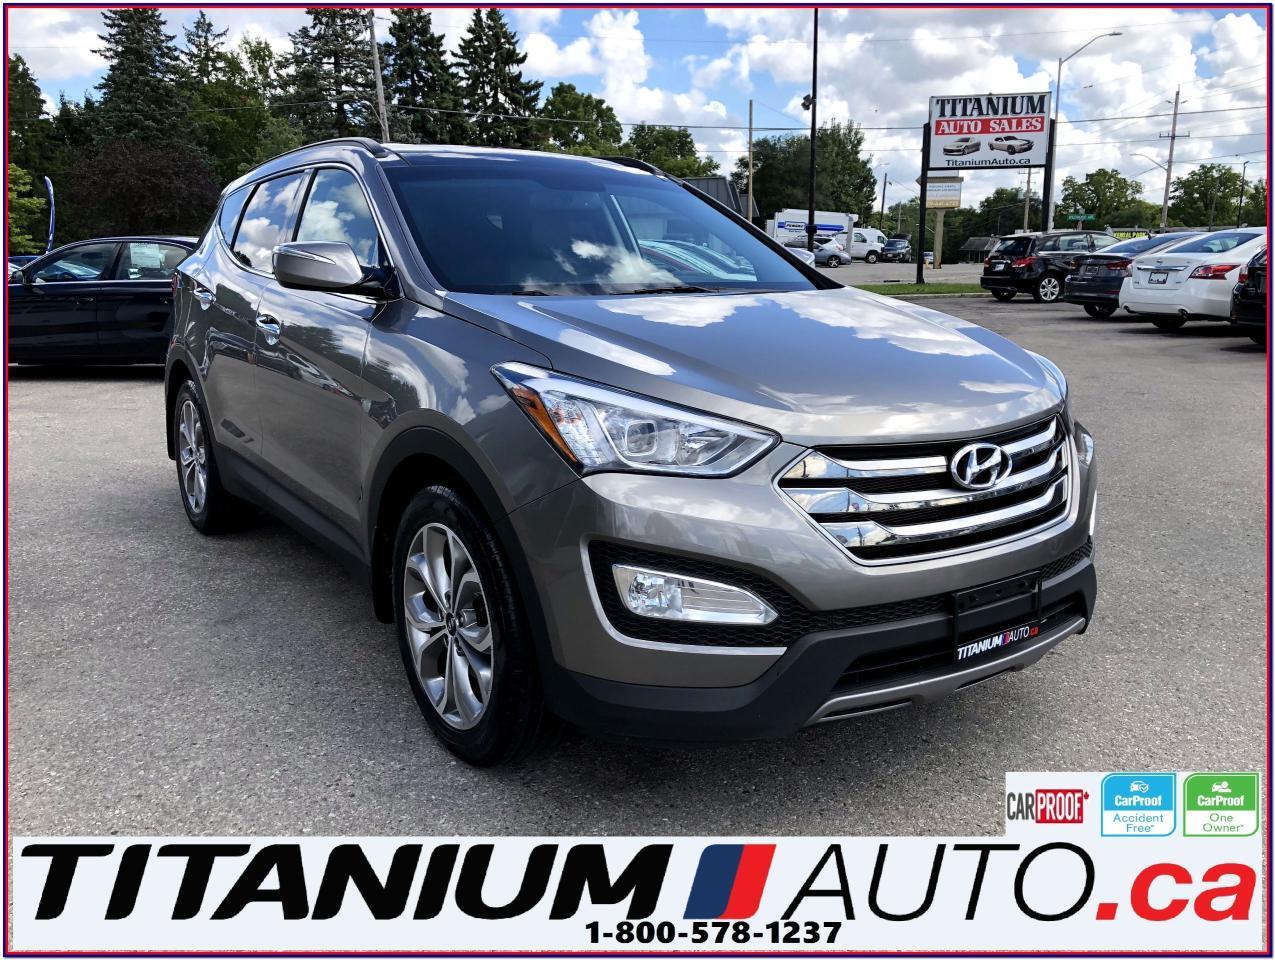 2015 Hyundai Santa Fe Limited-AWD-GPS-Camera-Pano Roof-Vented Leather-XM